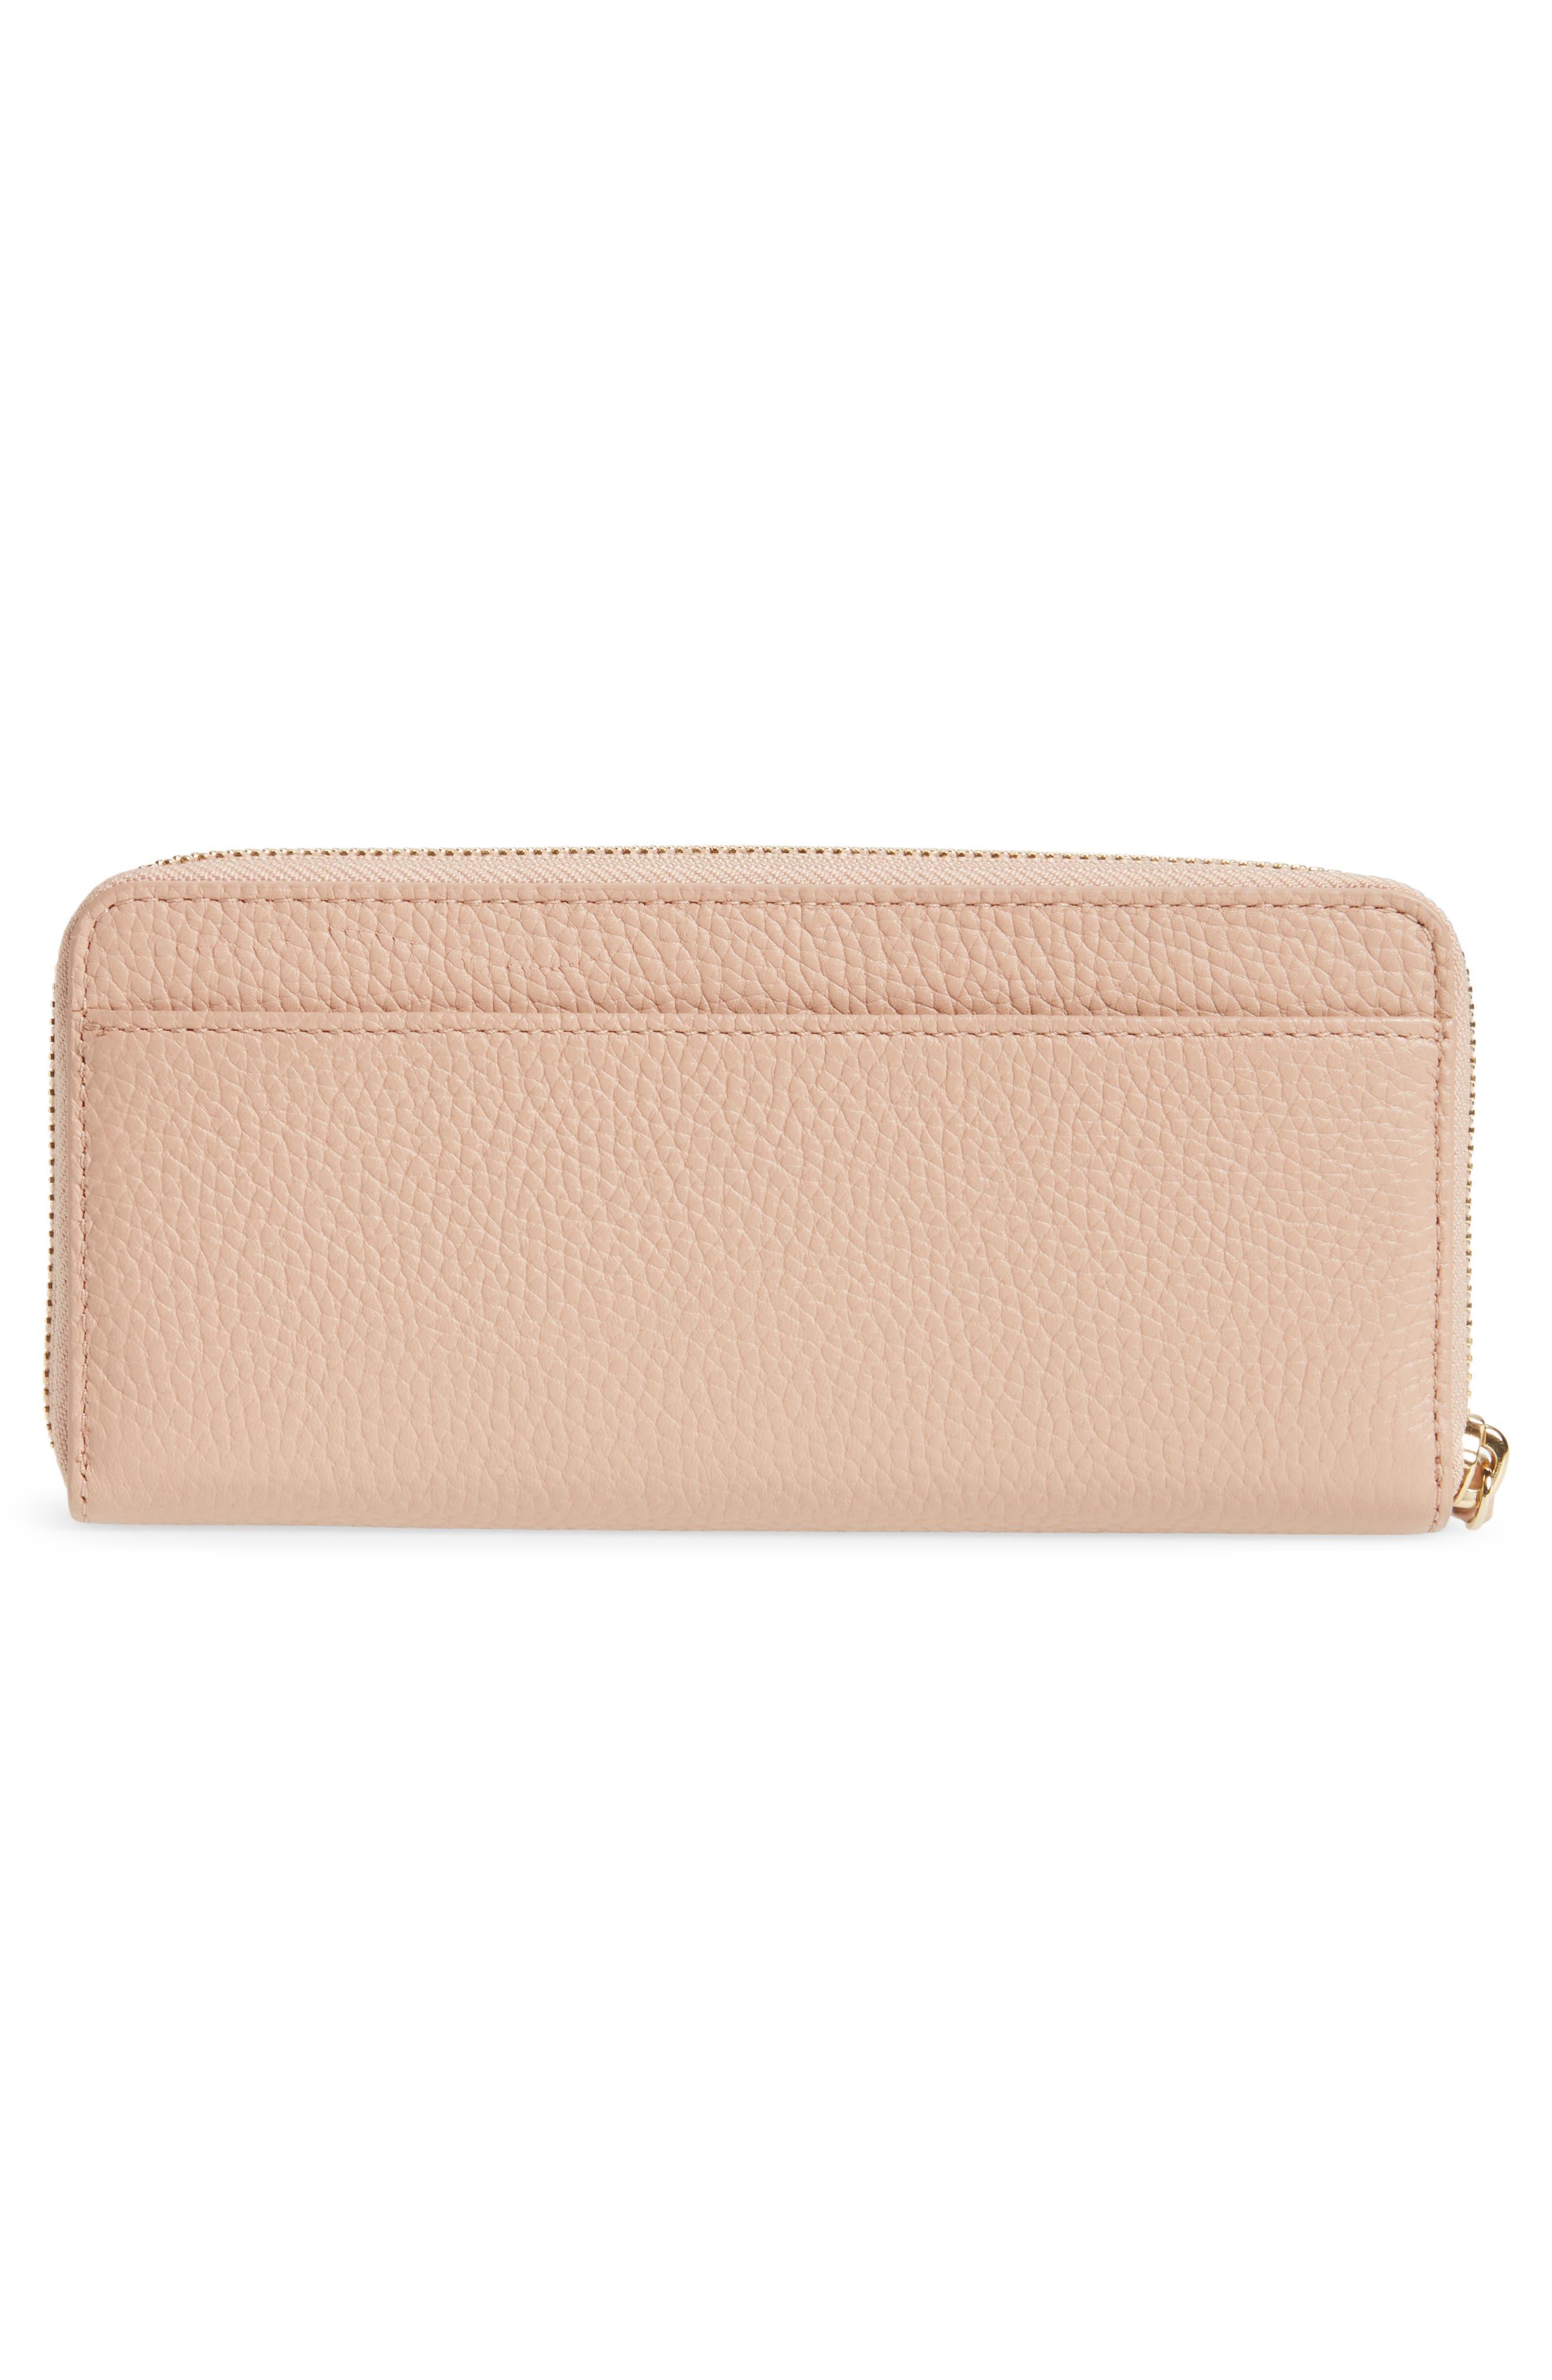 trent hill lindsey leather wallet,                             Alternate thumbnail 3, color,                             Ginger Tea